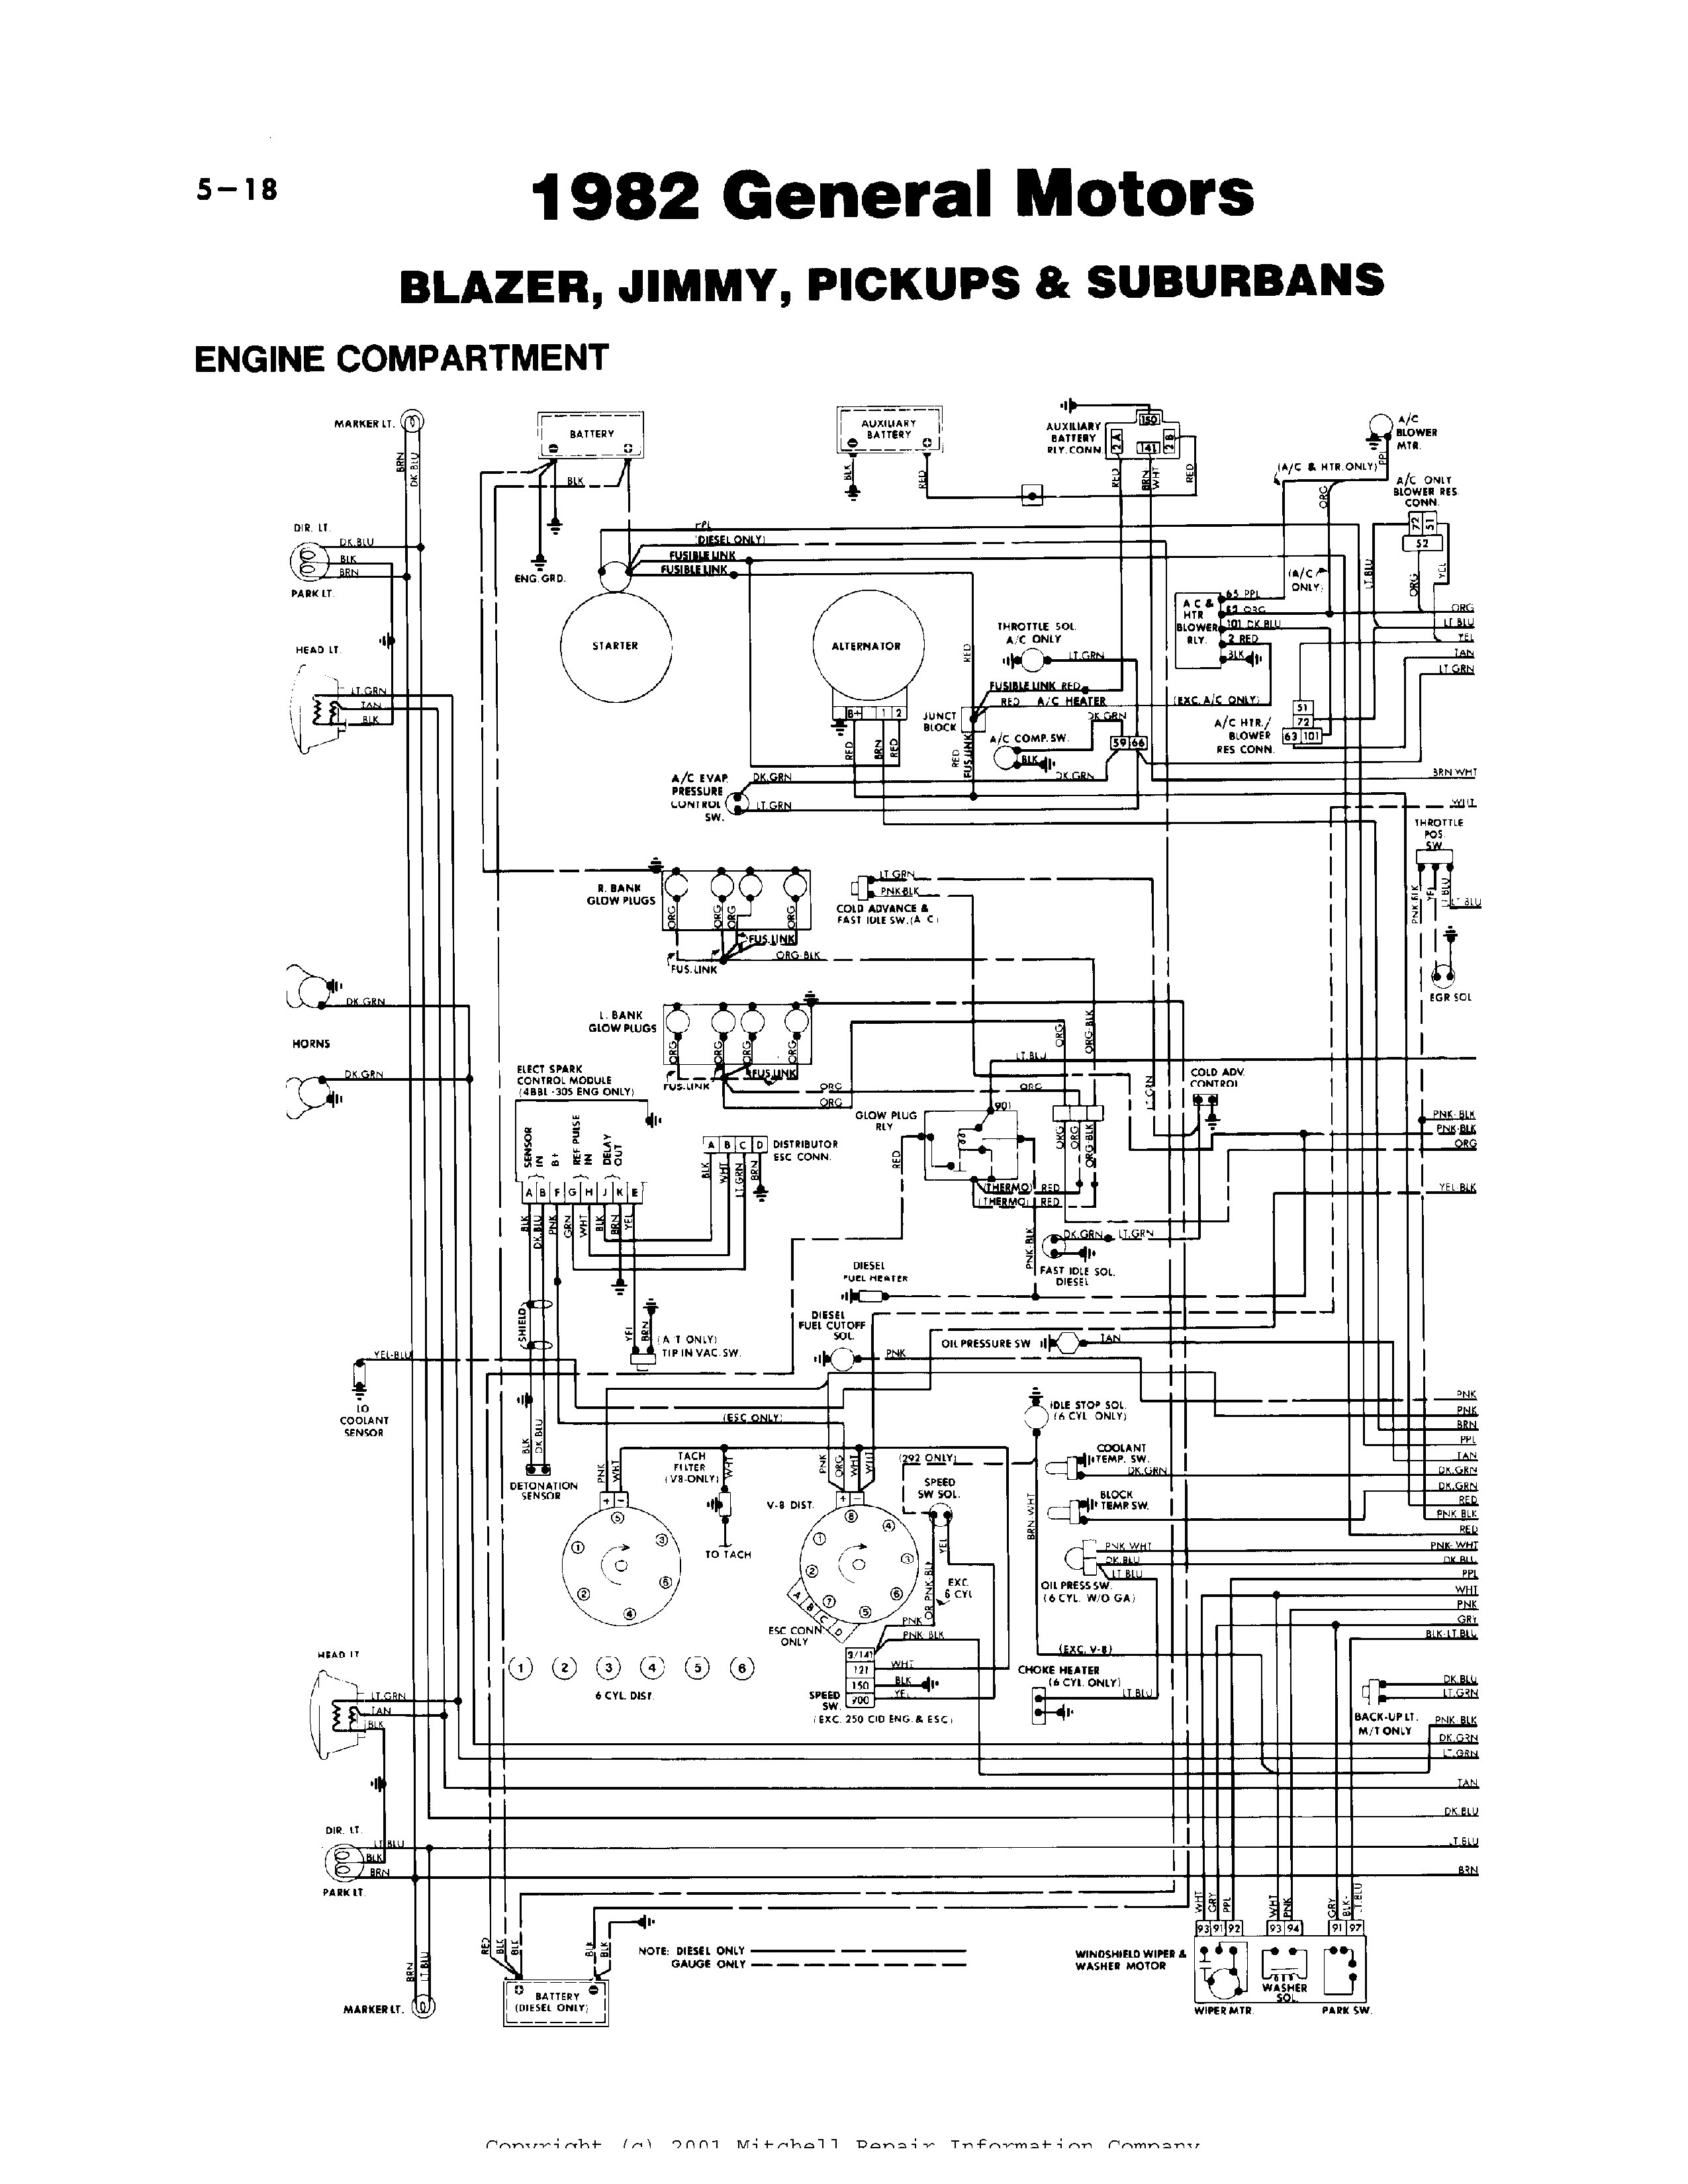 Diagram 1977 Chevy Truck Wiring Diagram Full Version Hd Quality Wiring Diagram Diagramwikik Urbanamentevitale It